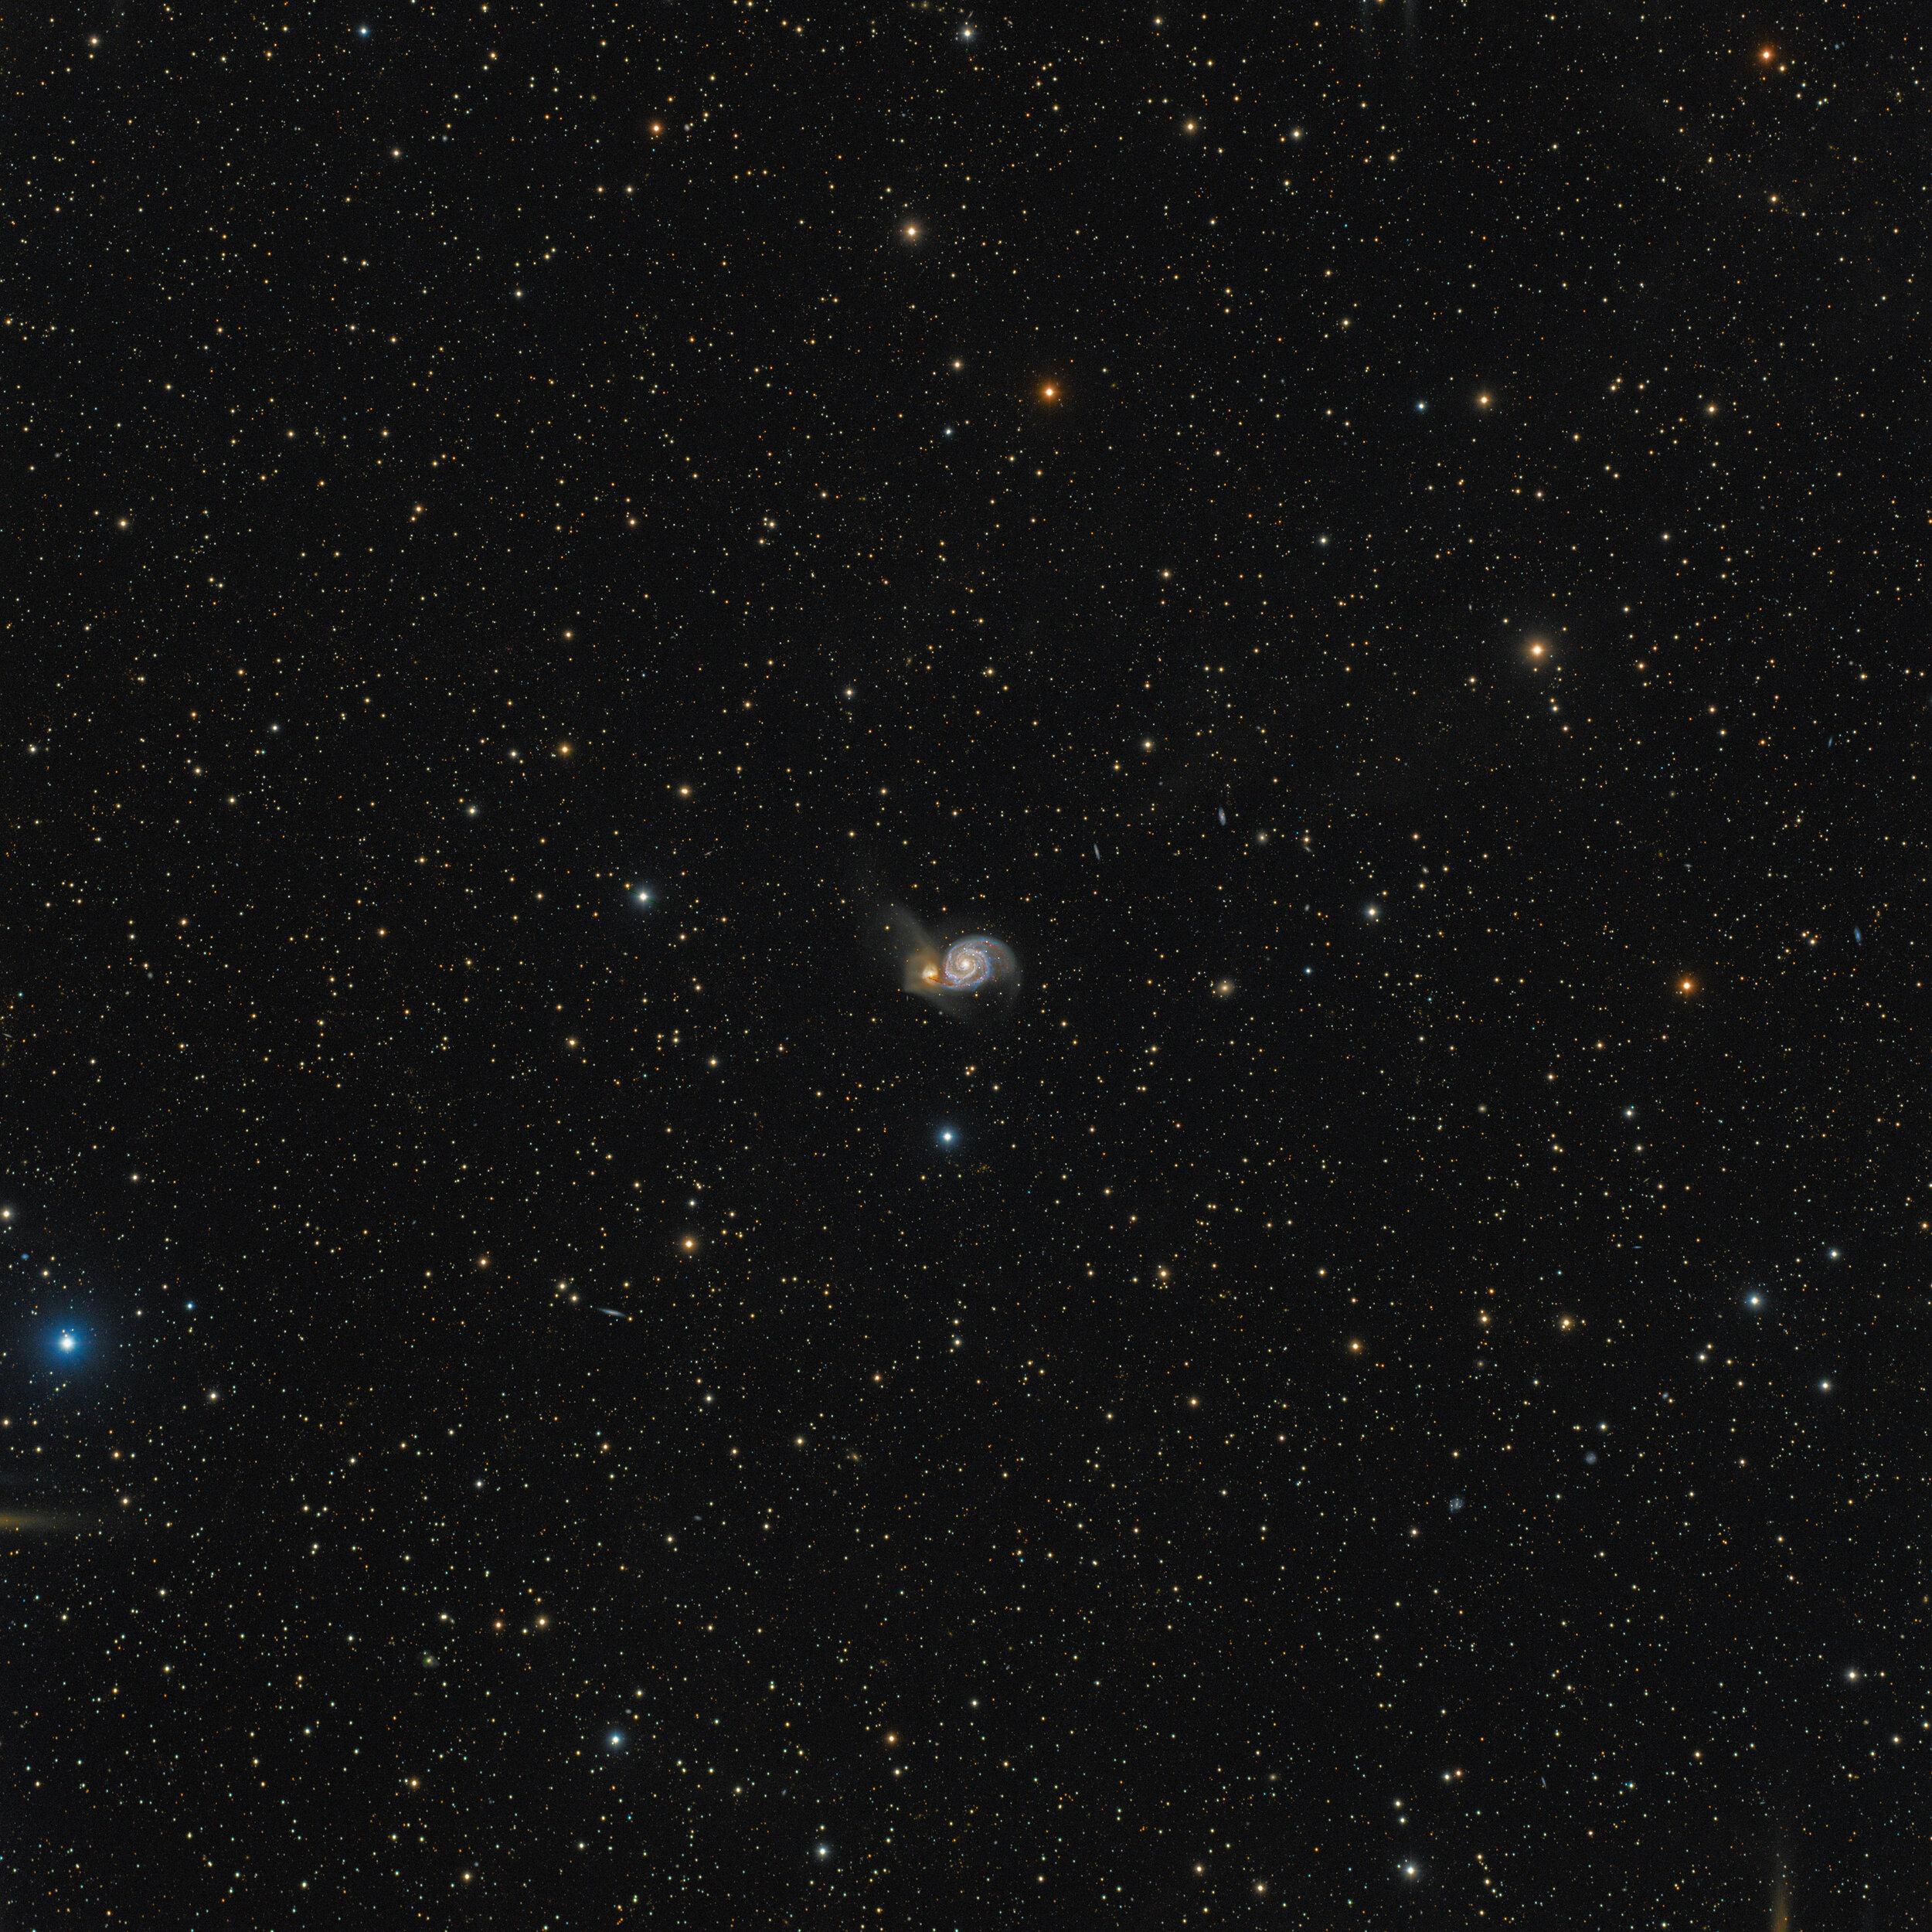 Whirlpool Galaxy (M51) Astrophotography Martin Rusterholz